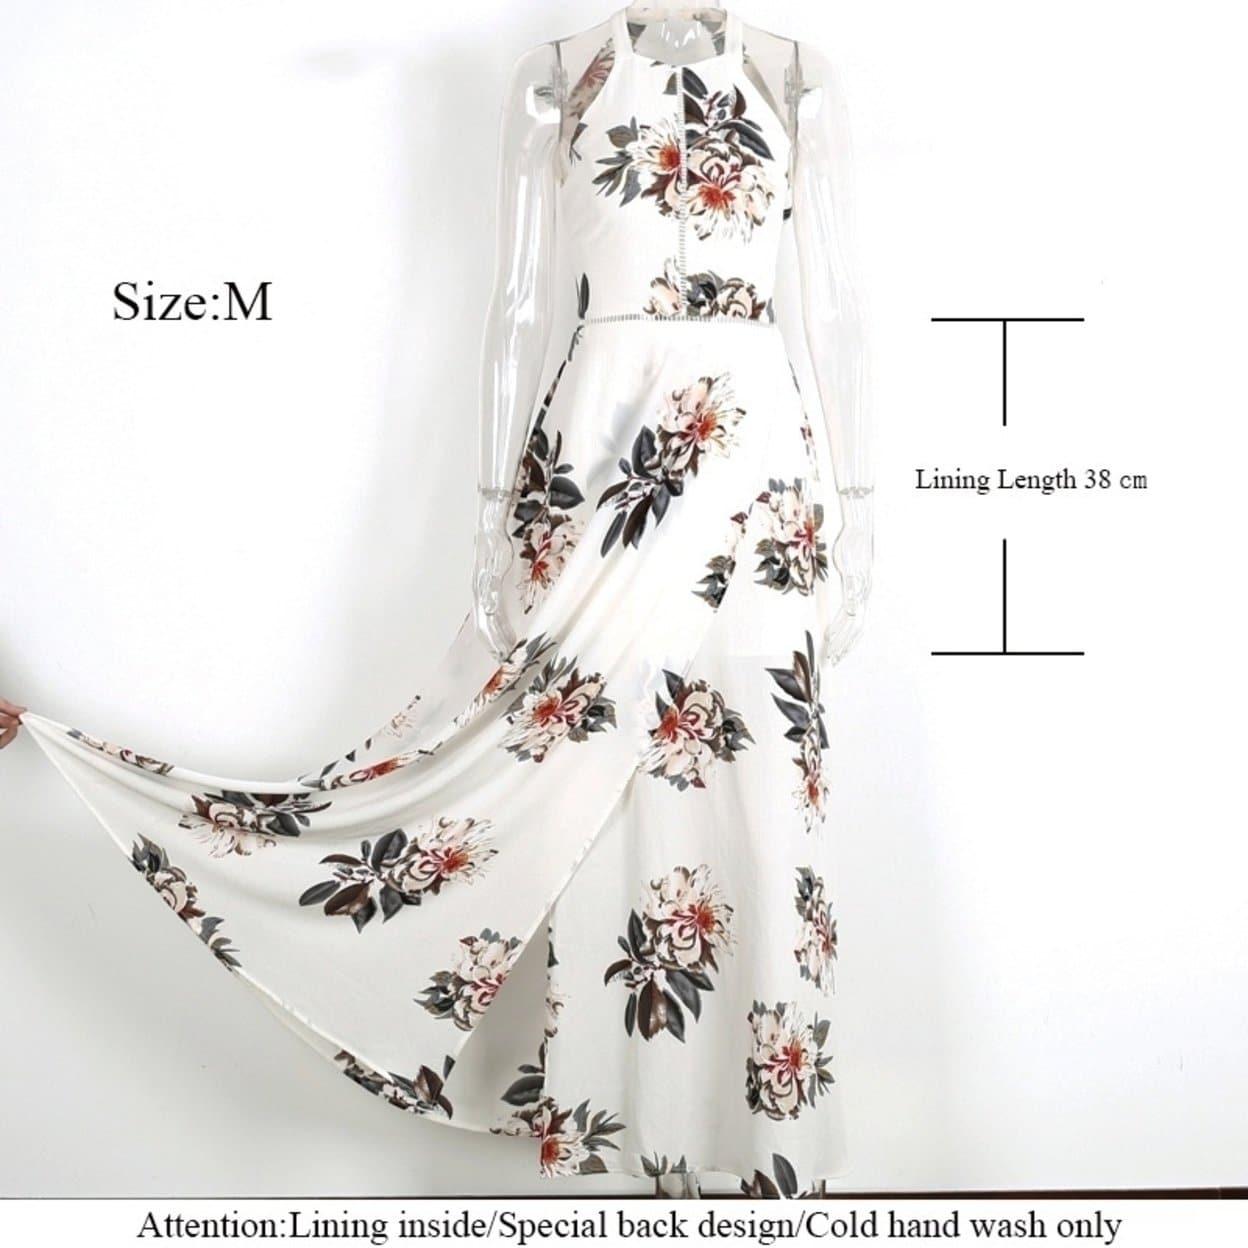 4935880af0766 Floral Print Halter Chiffon Long Dress Women Backless 2017 Maxi Dresses  Vestidos Hot White Split Beach Summer Dress